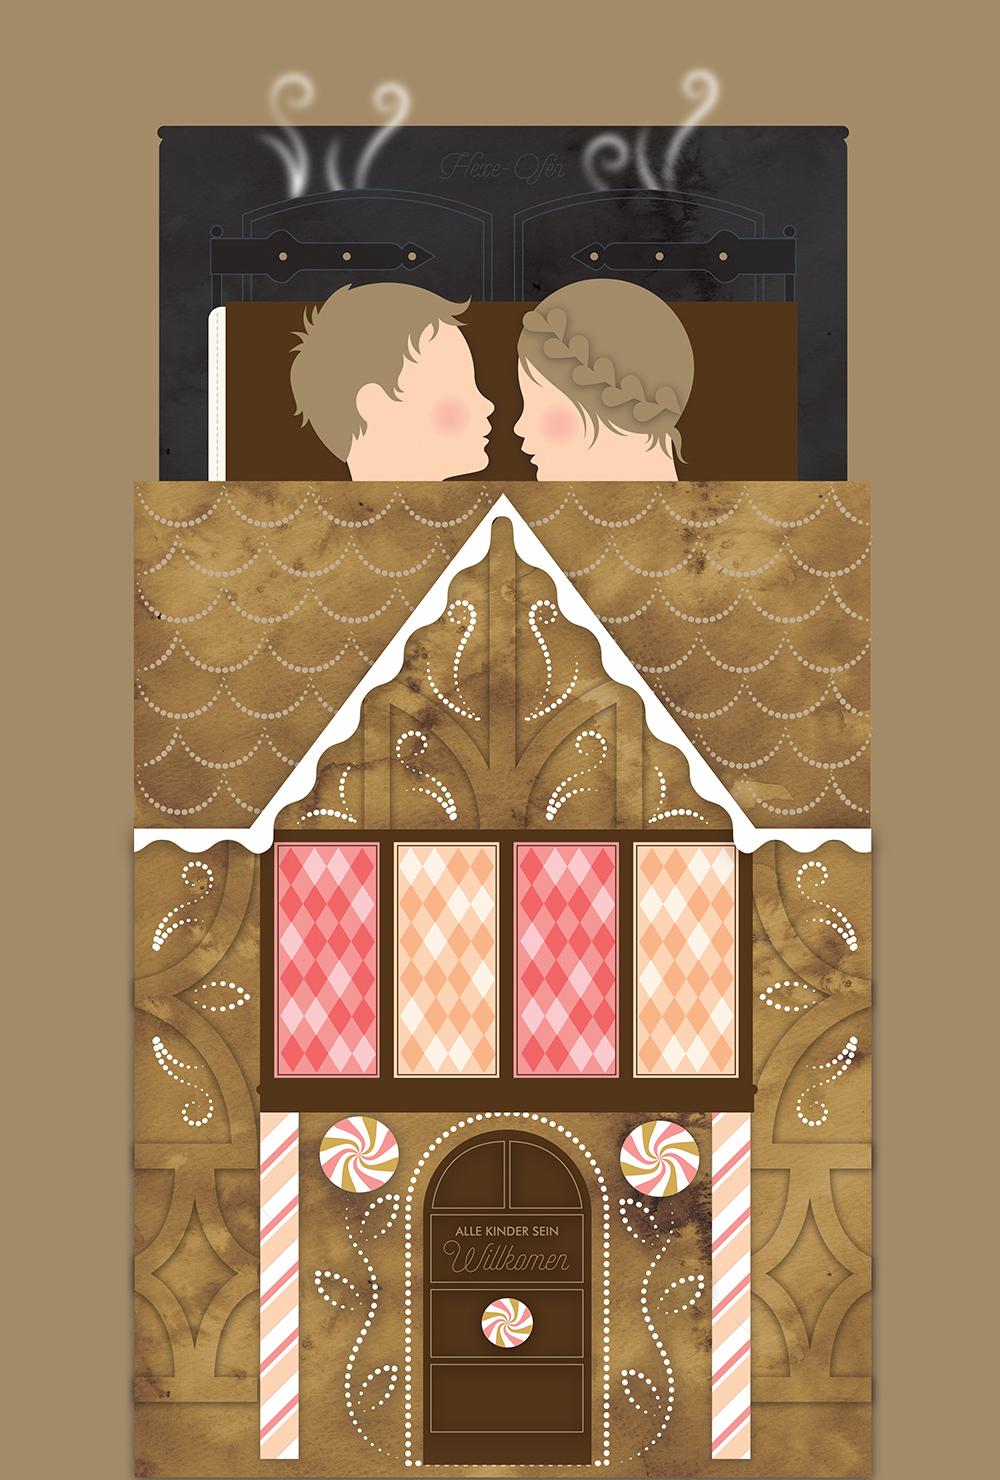 Bedtime Stories: Hanzel & Gretel